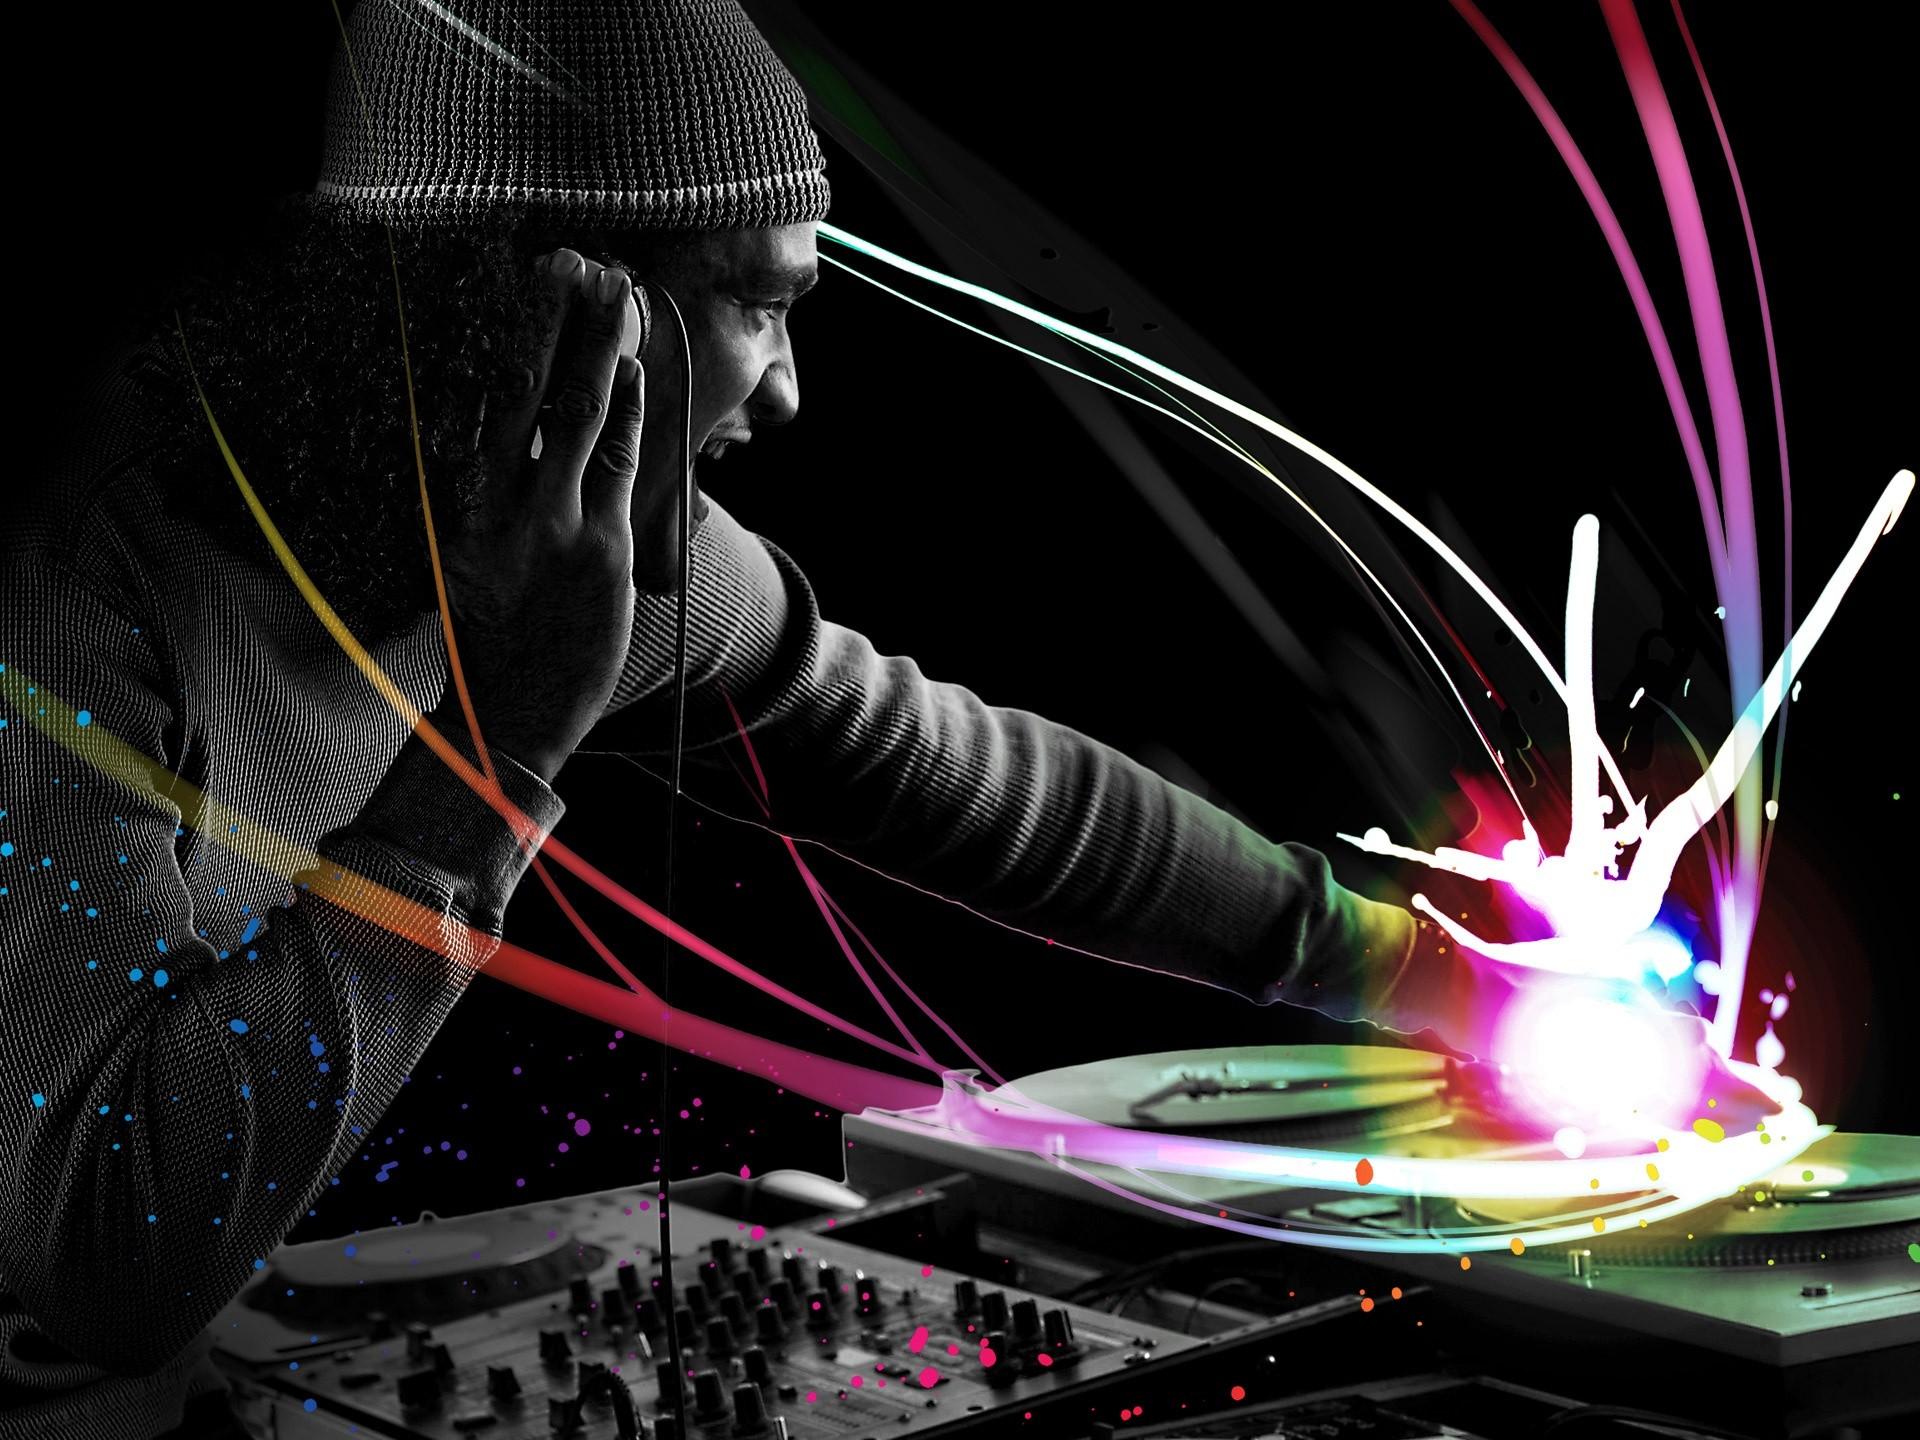 10 Best House Music Dj Wallpaper Full Hd 1080p For Pc: DJ Full HD Wallpaper And Background Image